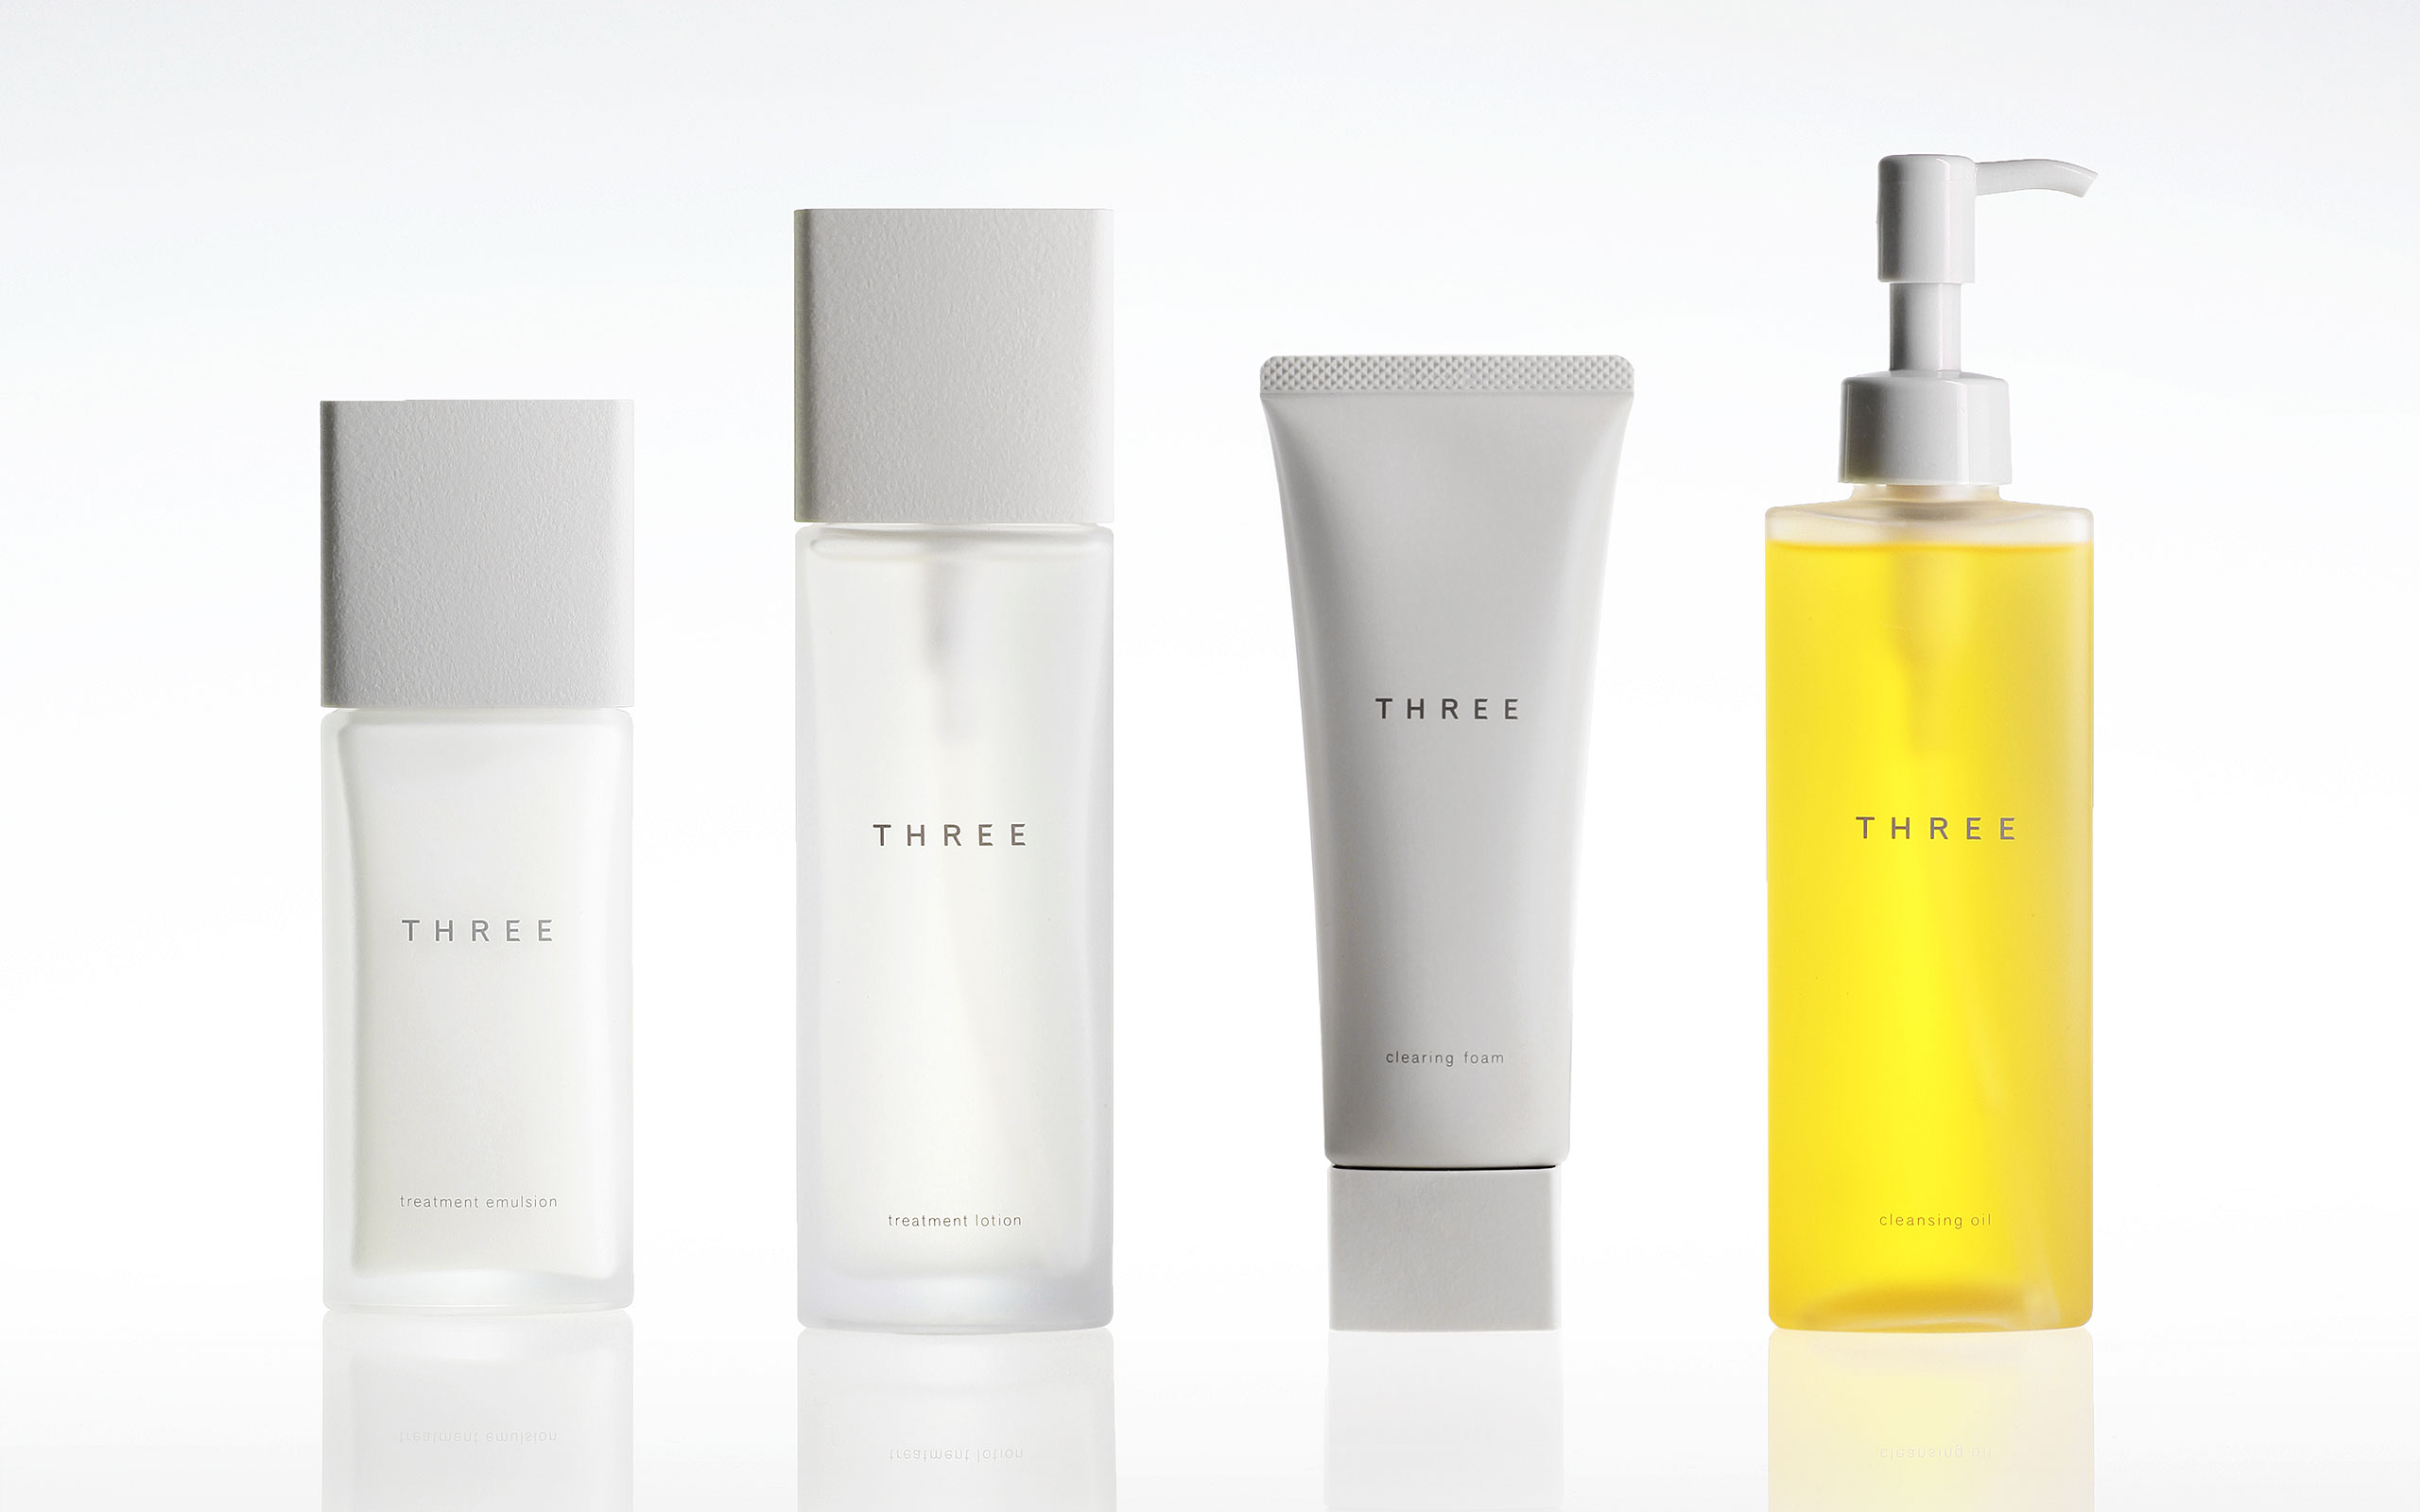 Tokujin Yoshioka Designs THREE's New Skincare Line